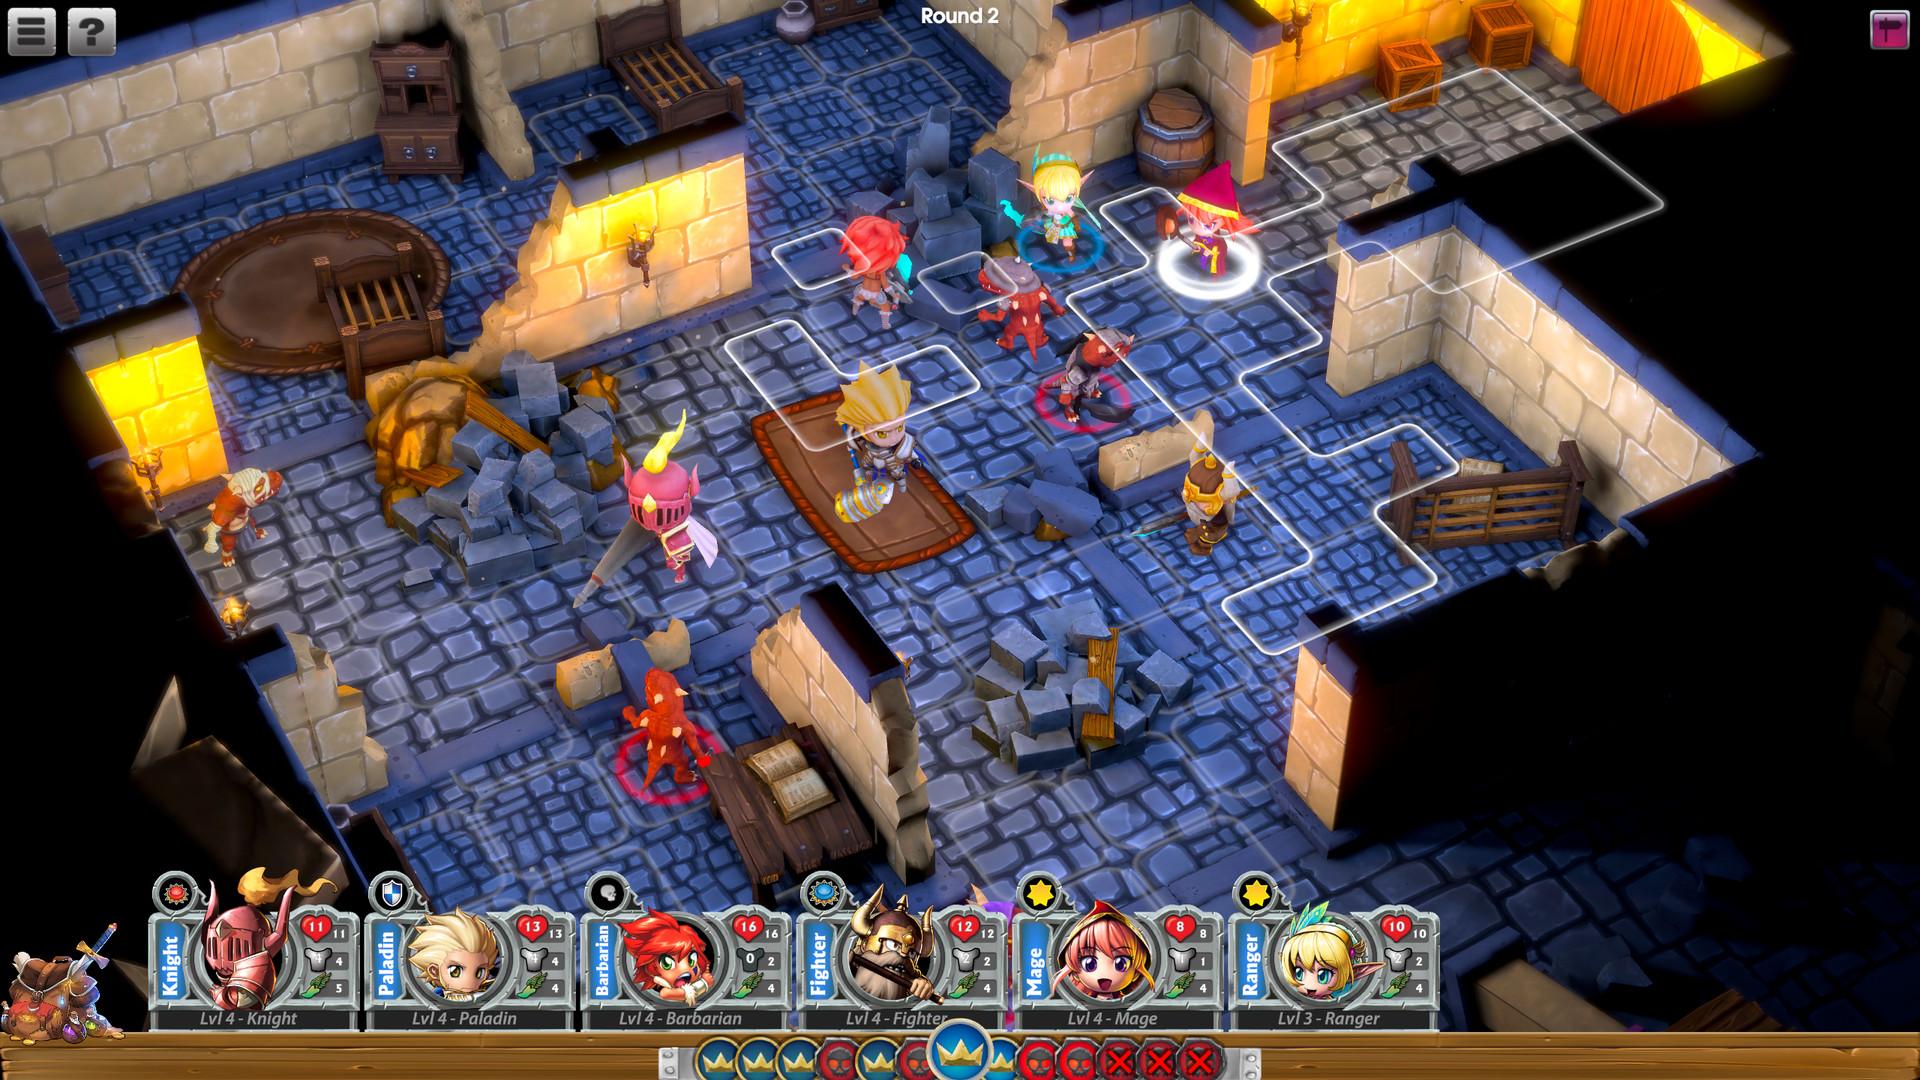 Super Dungeon Tactics Screenshot 3